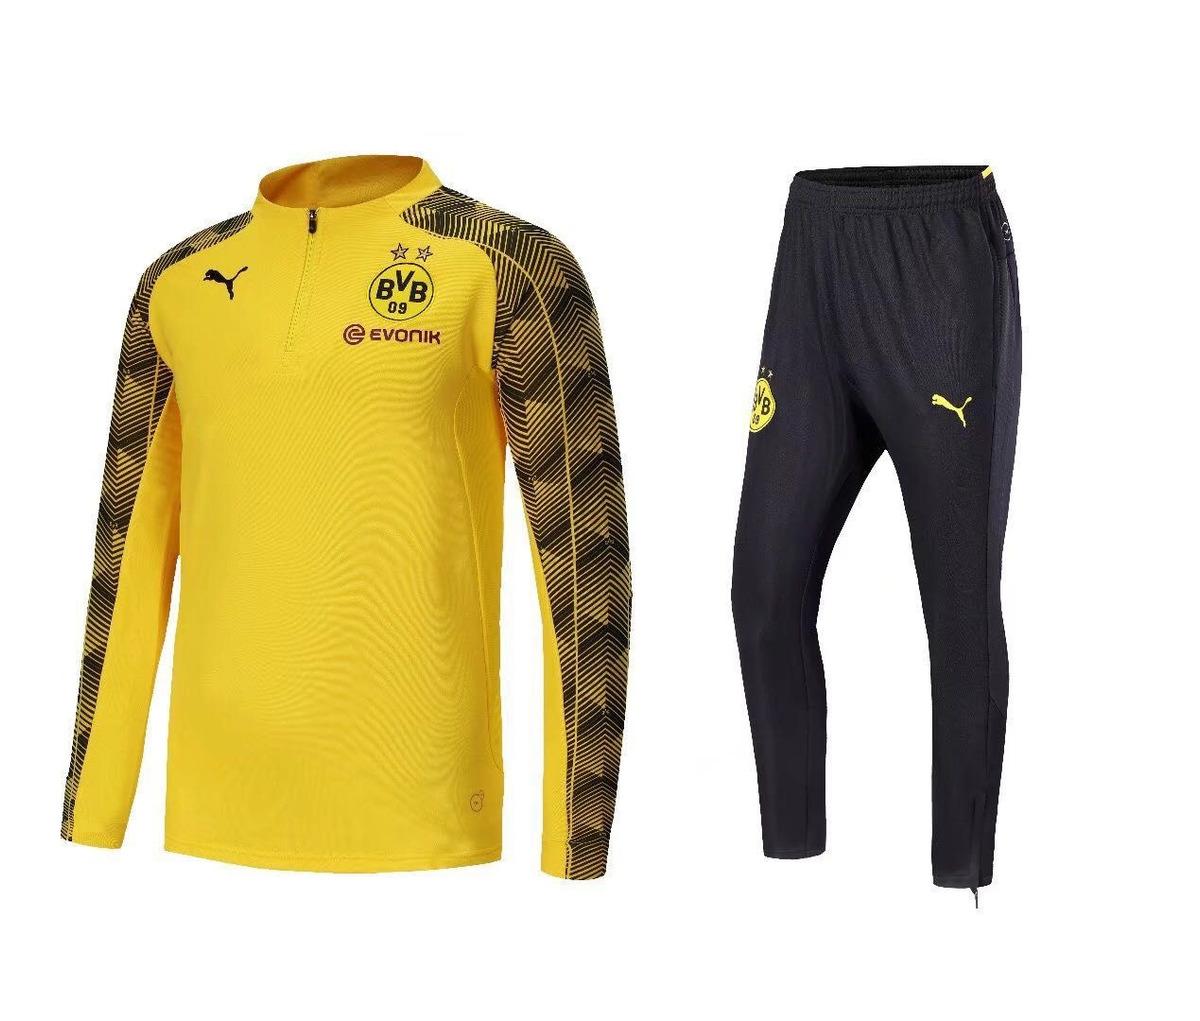 05718e209de08 Sudadera De Borussia Dortmund 2019 (envió Gratis) -   140.000 en ...